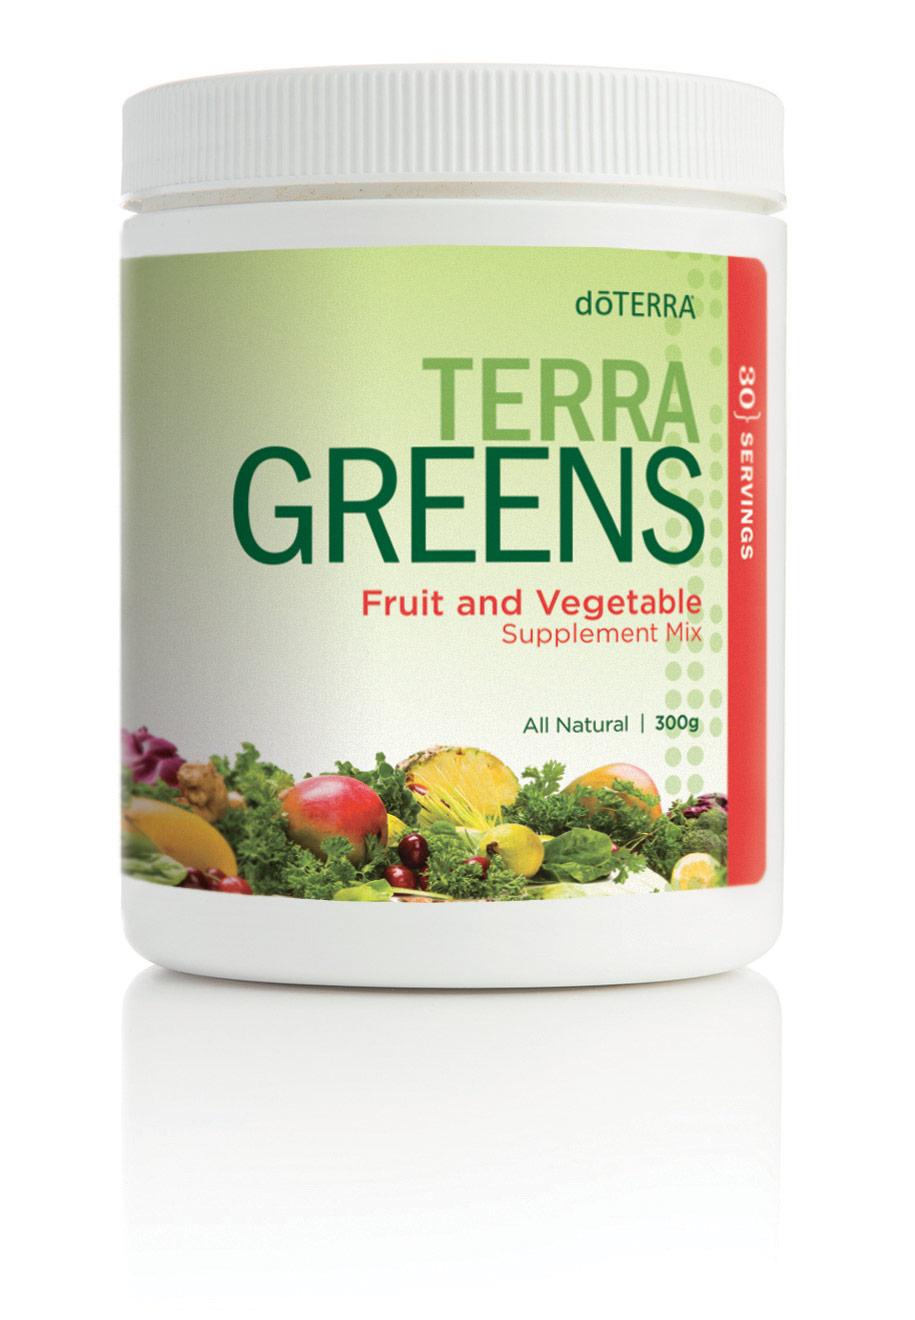 TerraGreens.jpg